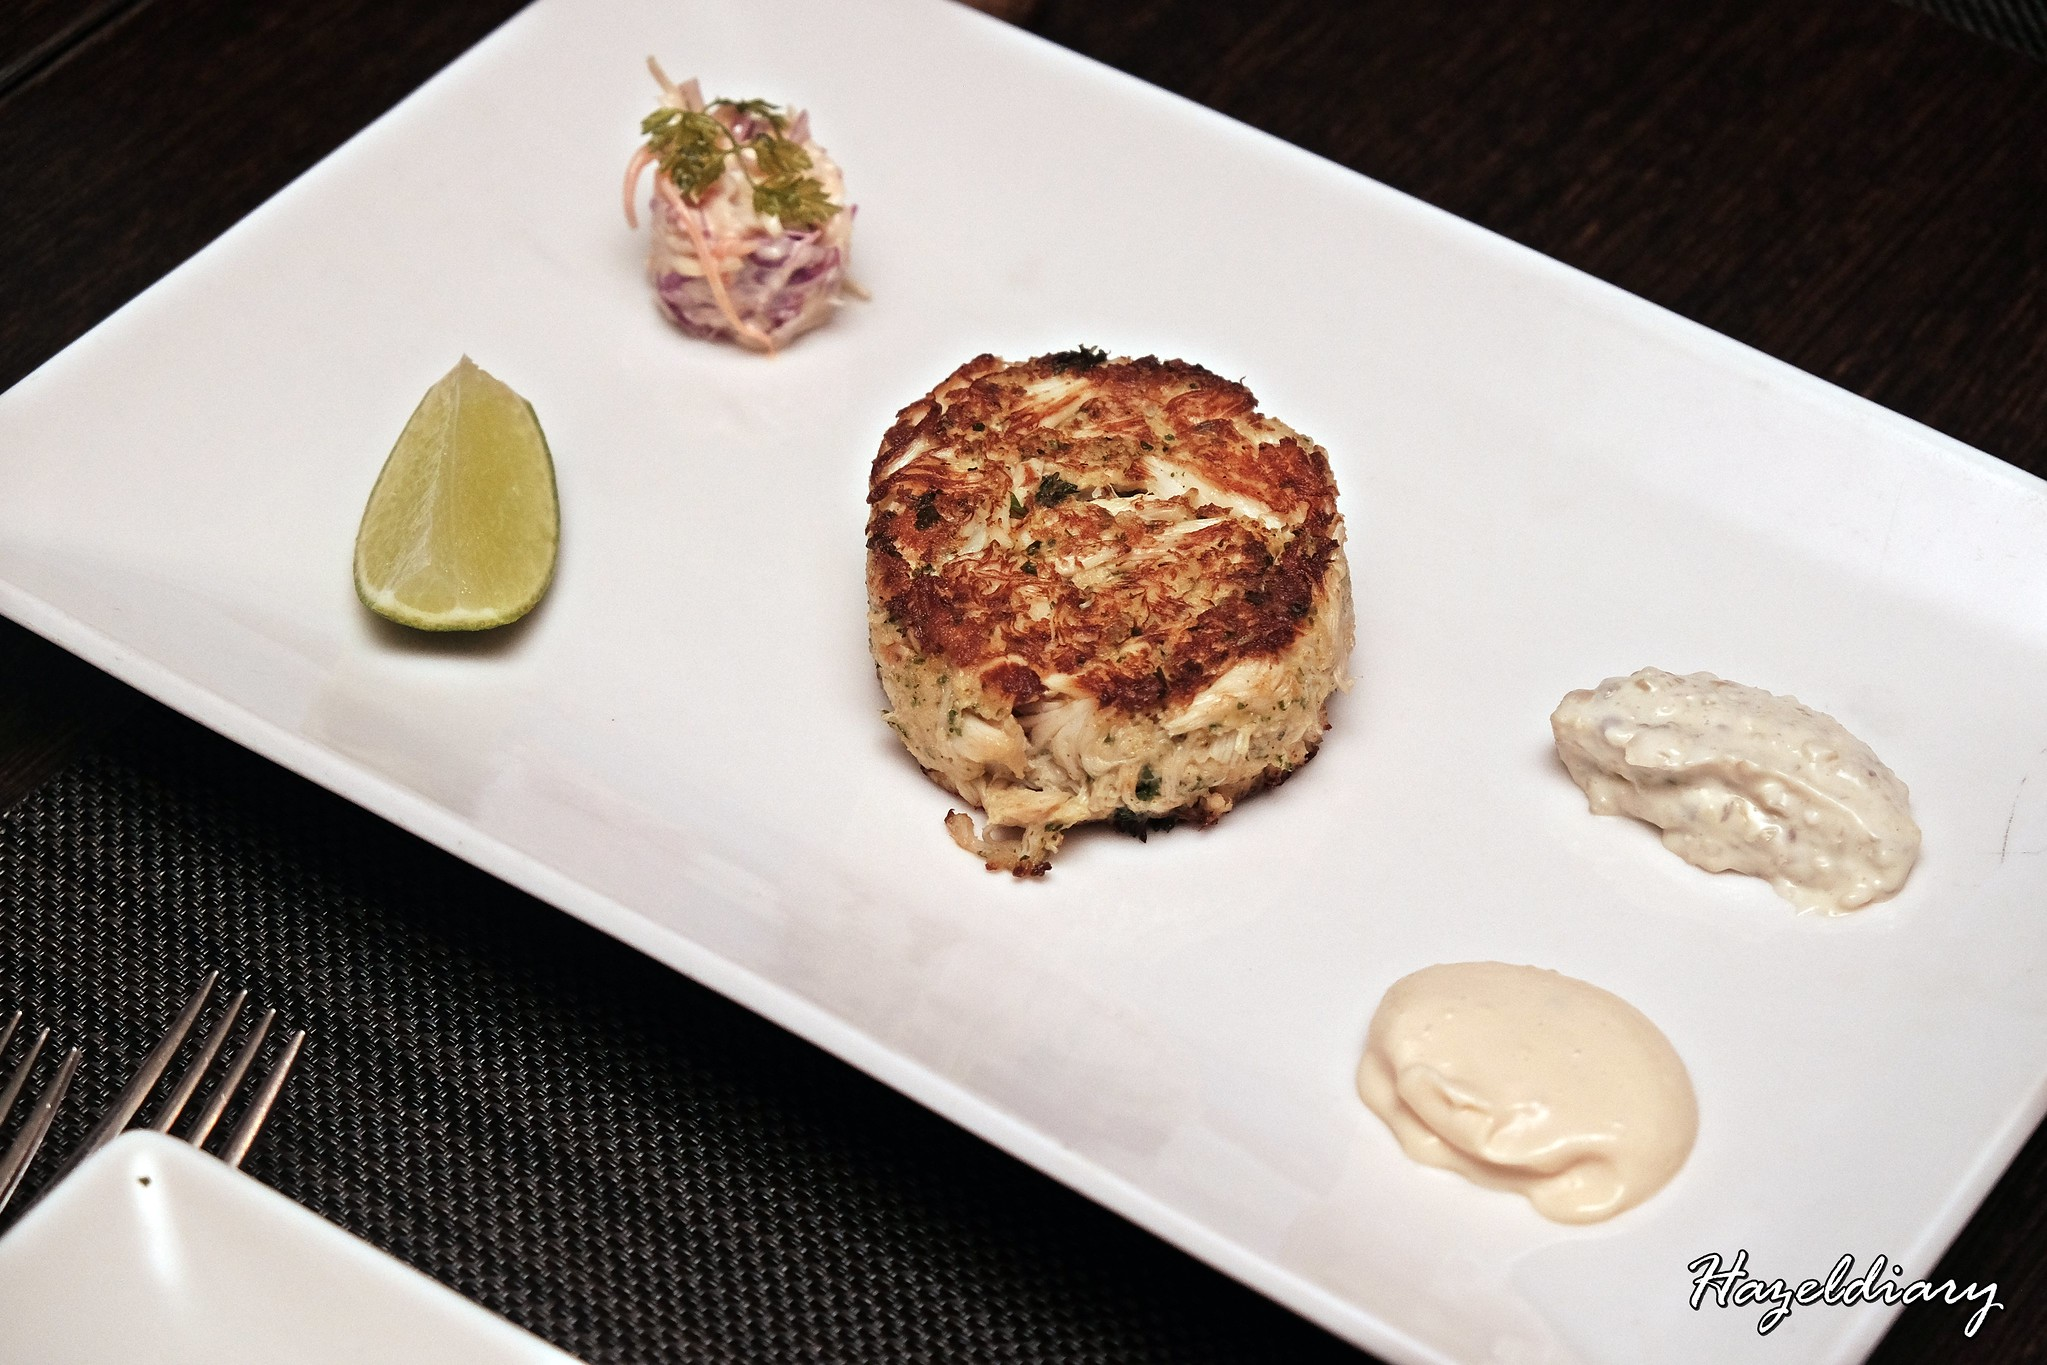 wooloomooloo steakhouse-Lump Crab Cake